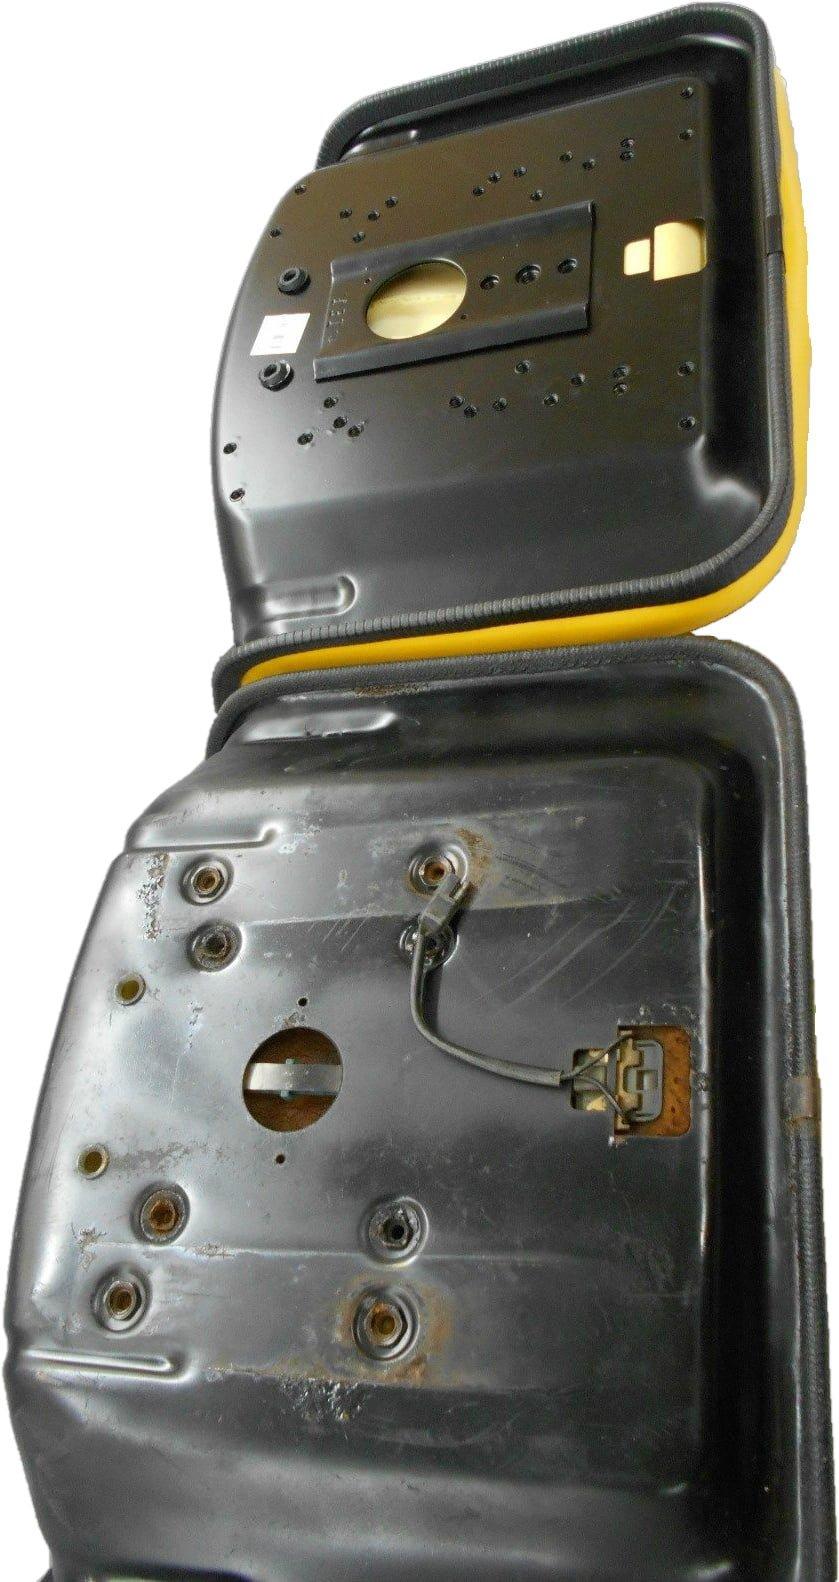 YELLOW SEAT JOHN DEERE 130, 160, 165, 214, 316, 318, 322, 330, 332, on john deere 4 wheeler, john deere electrical parts, john deere ignition wiring diagram, john deere five wheel, john deere parts catalog,